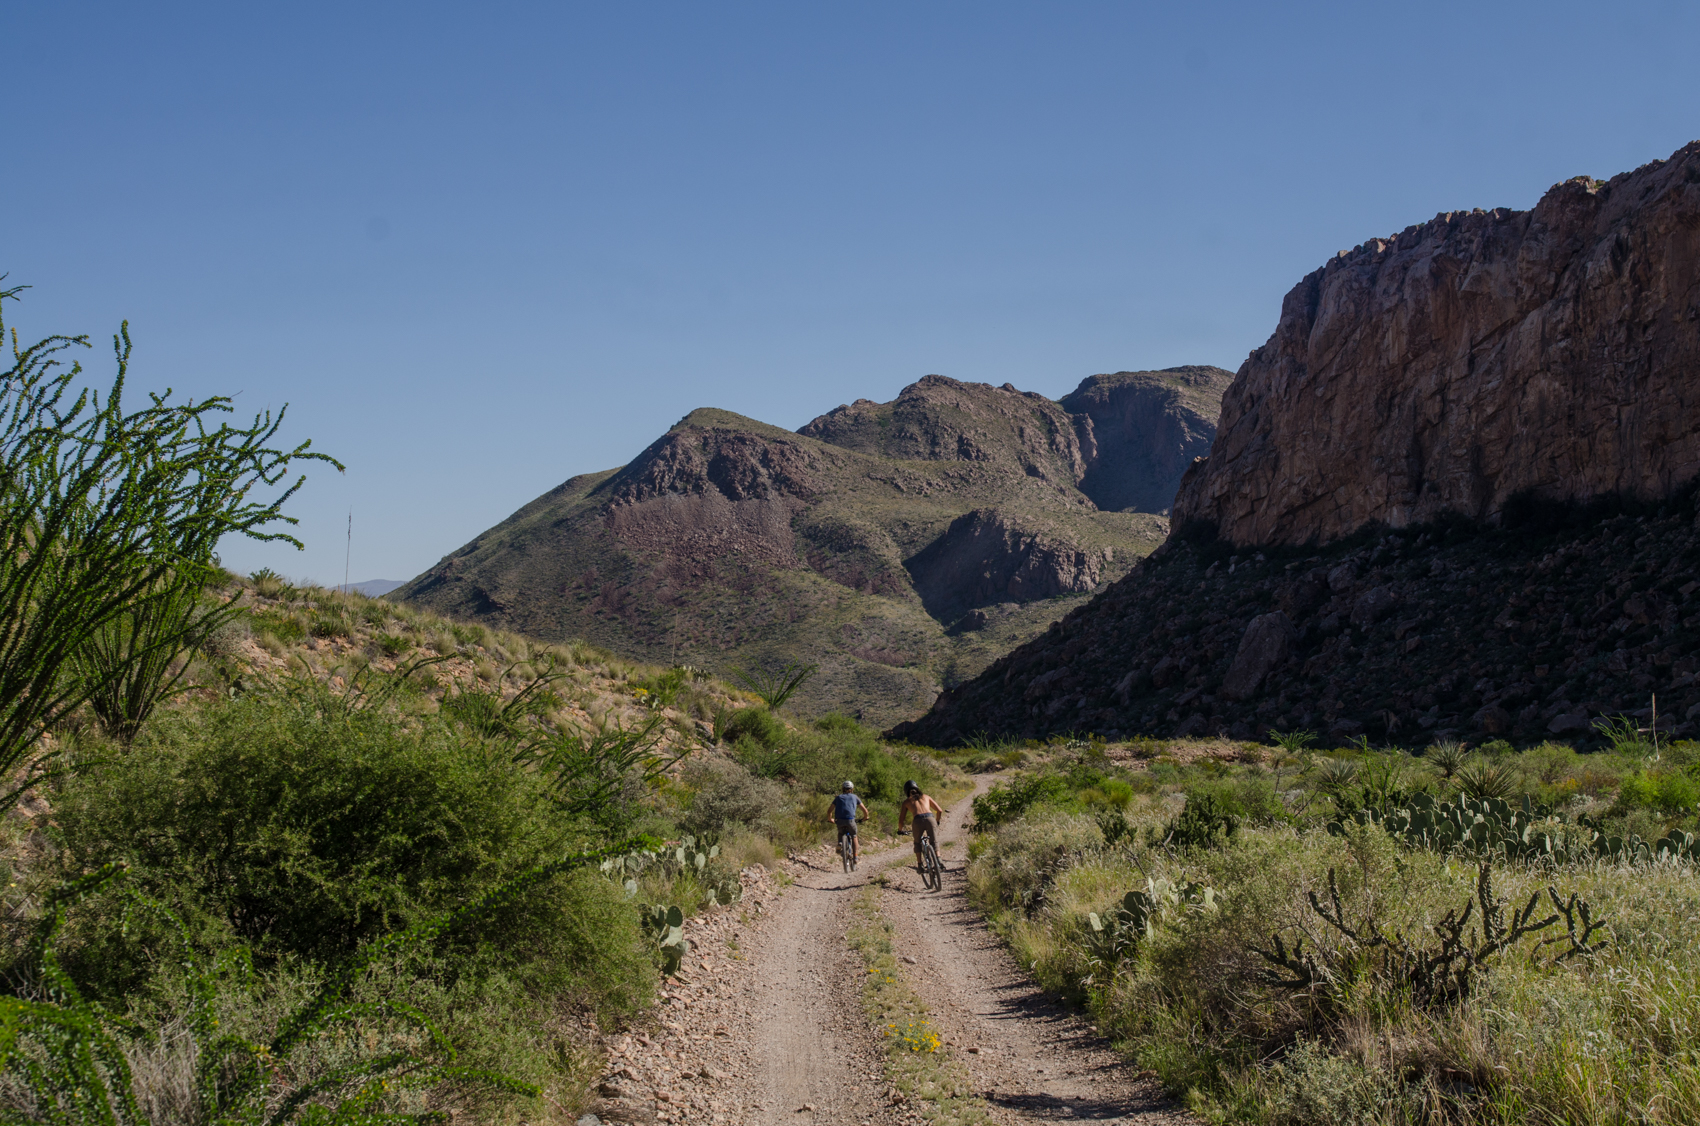 Mountain biking in big bend national park-leh cycling goods-23.jpg